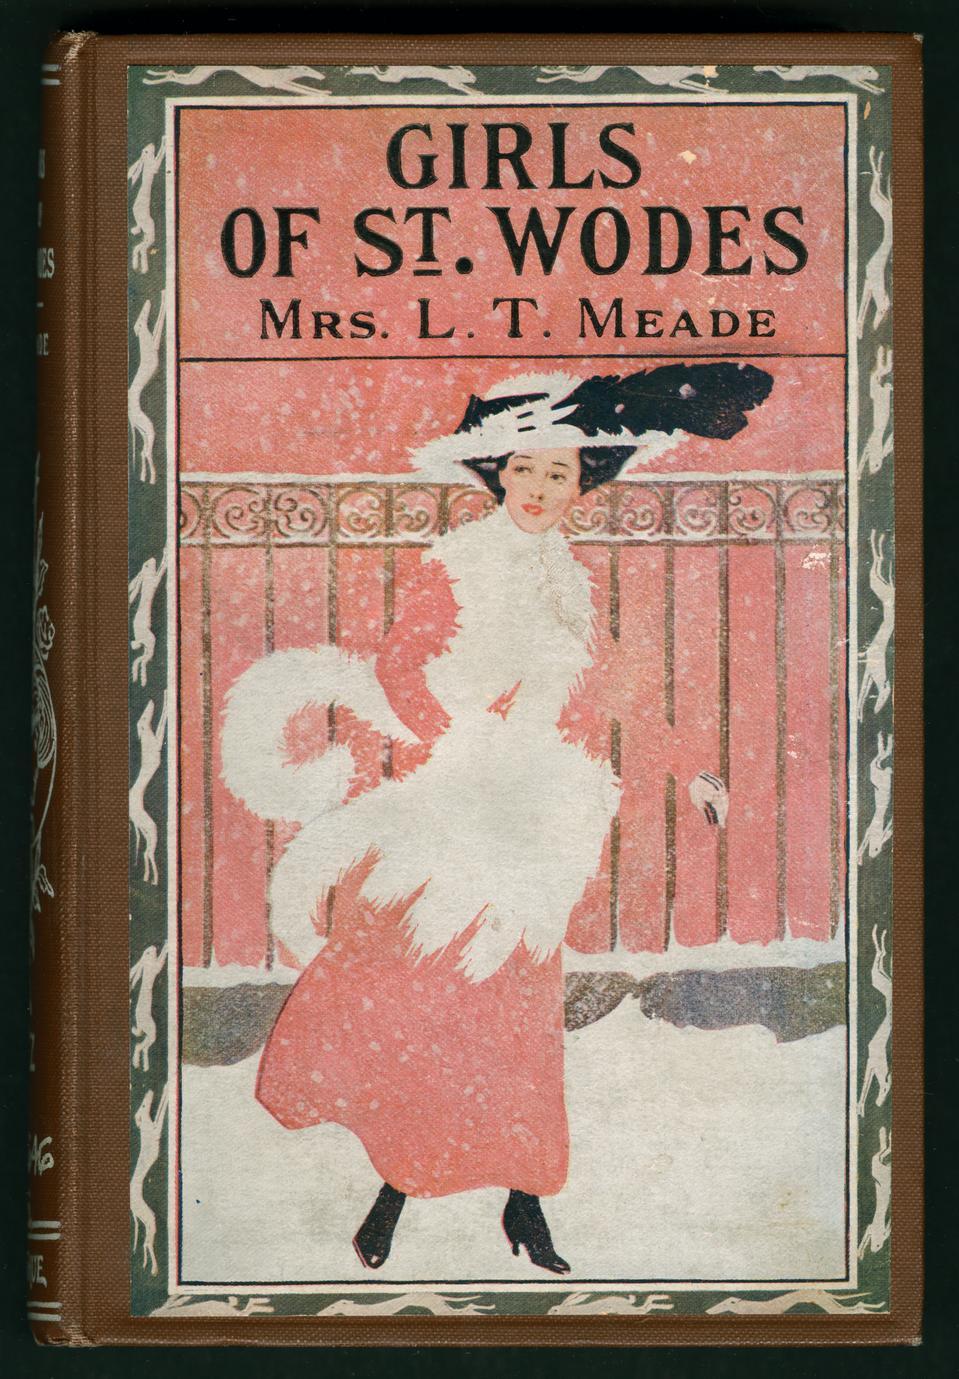 The girls of St. Wode's (1 of 2)